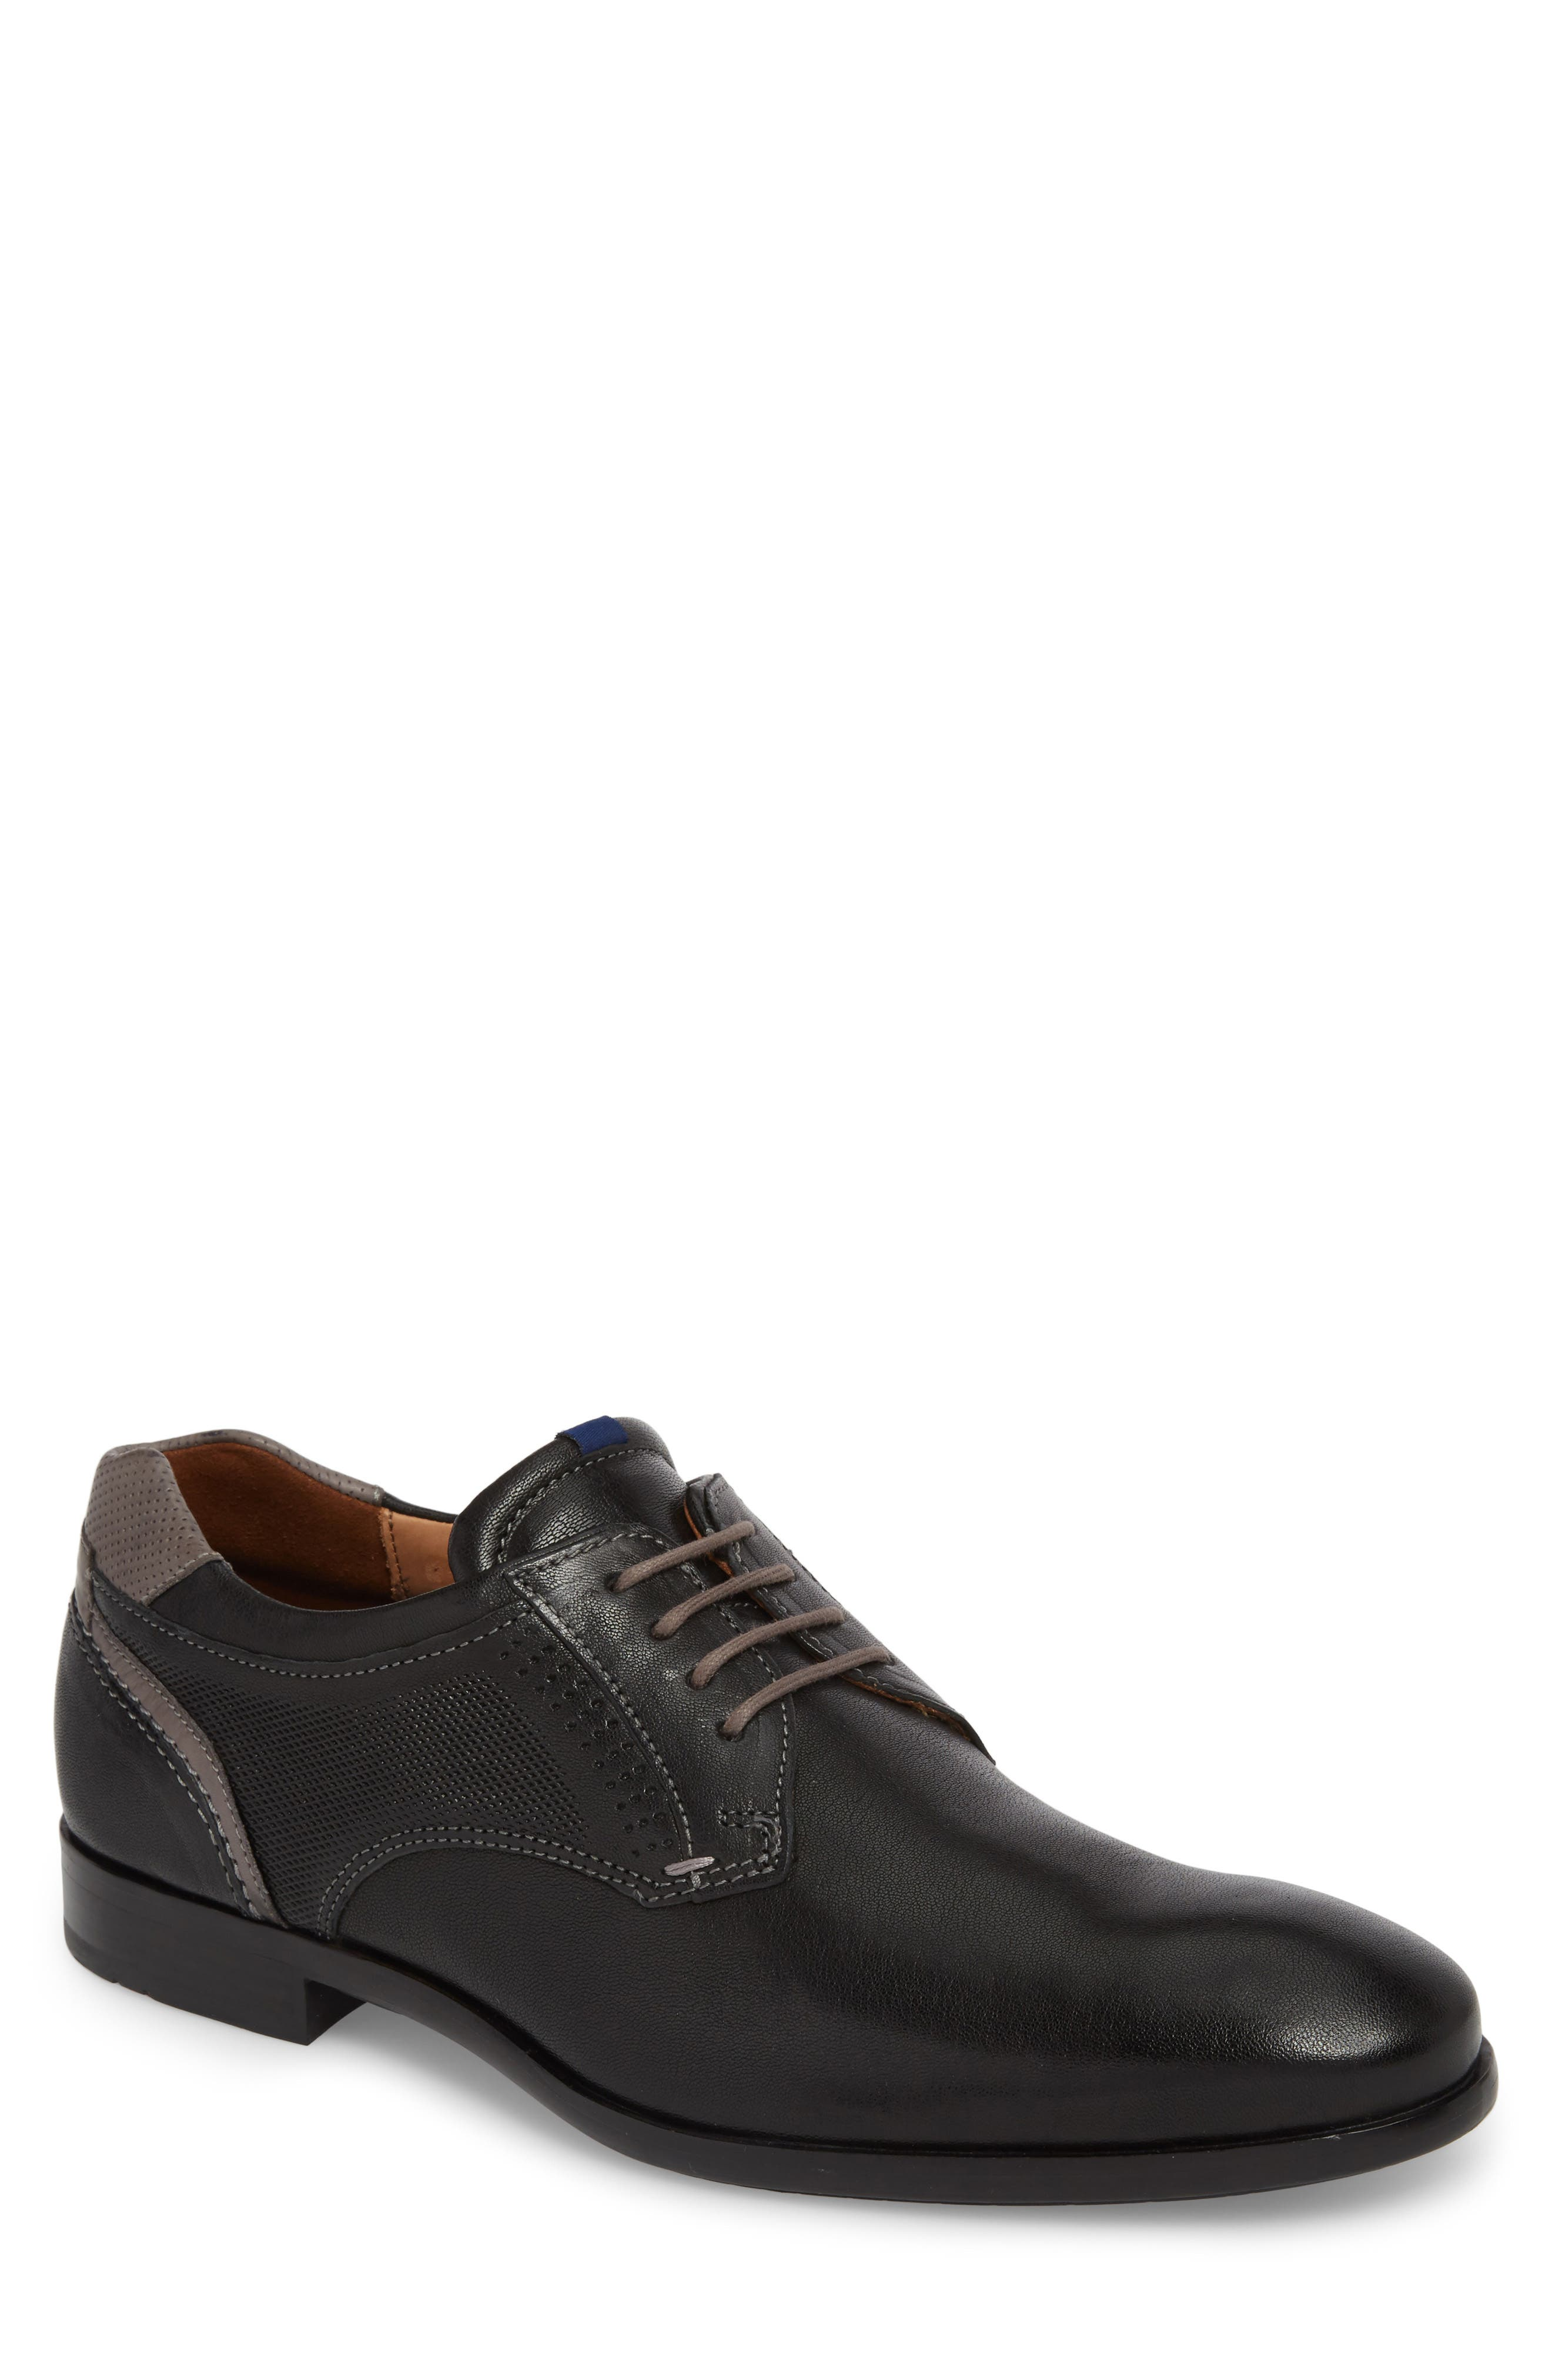 Morice Plain Toe Derby,                         Main,                         color, BLACK/ GREY LEATHER